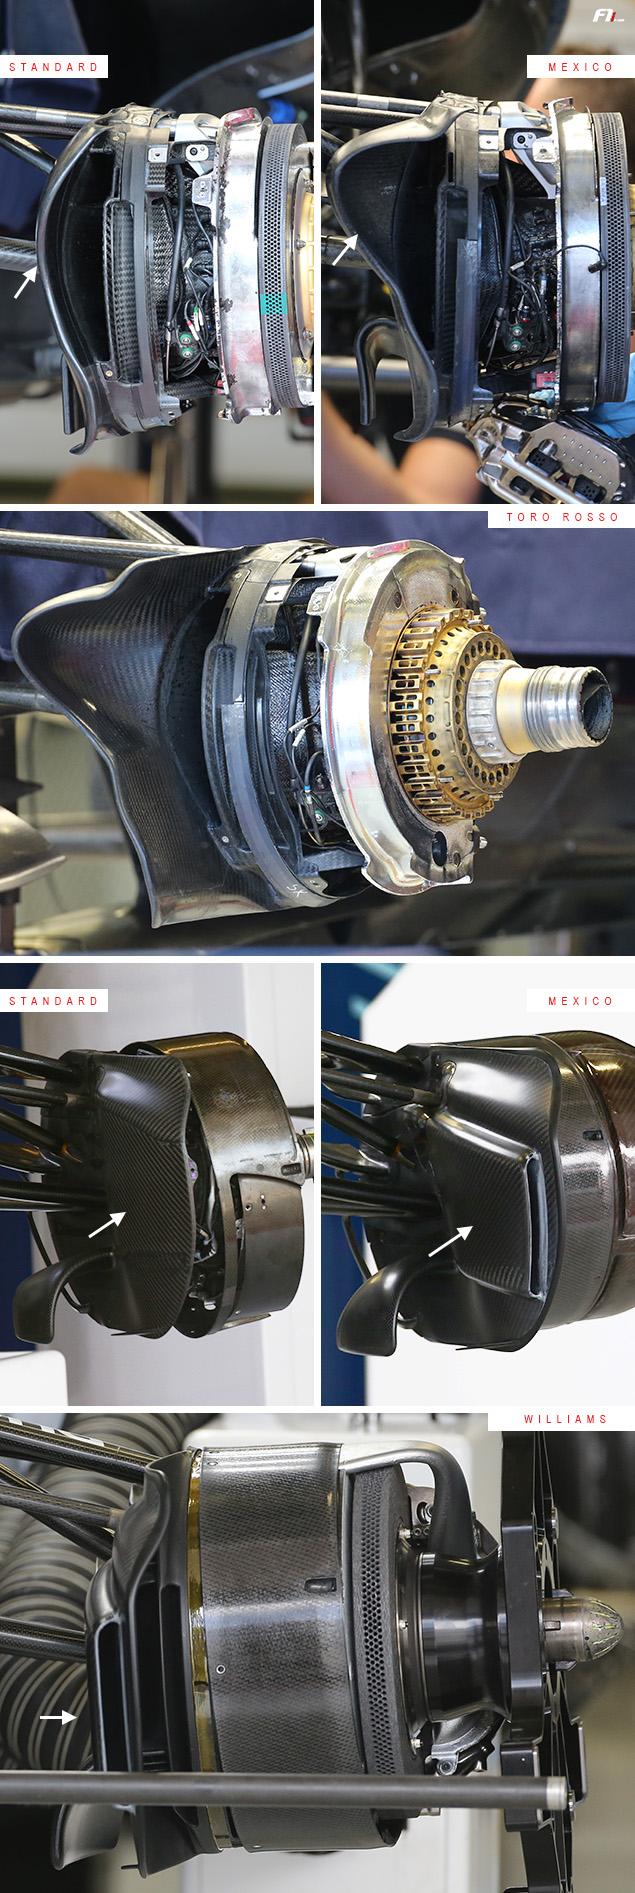 f1-technical-analysis-mexico-brakes-toro-rosso-williams